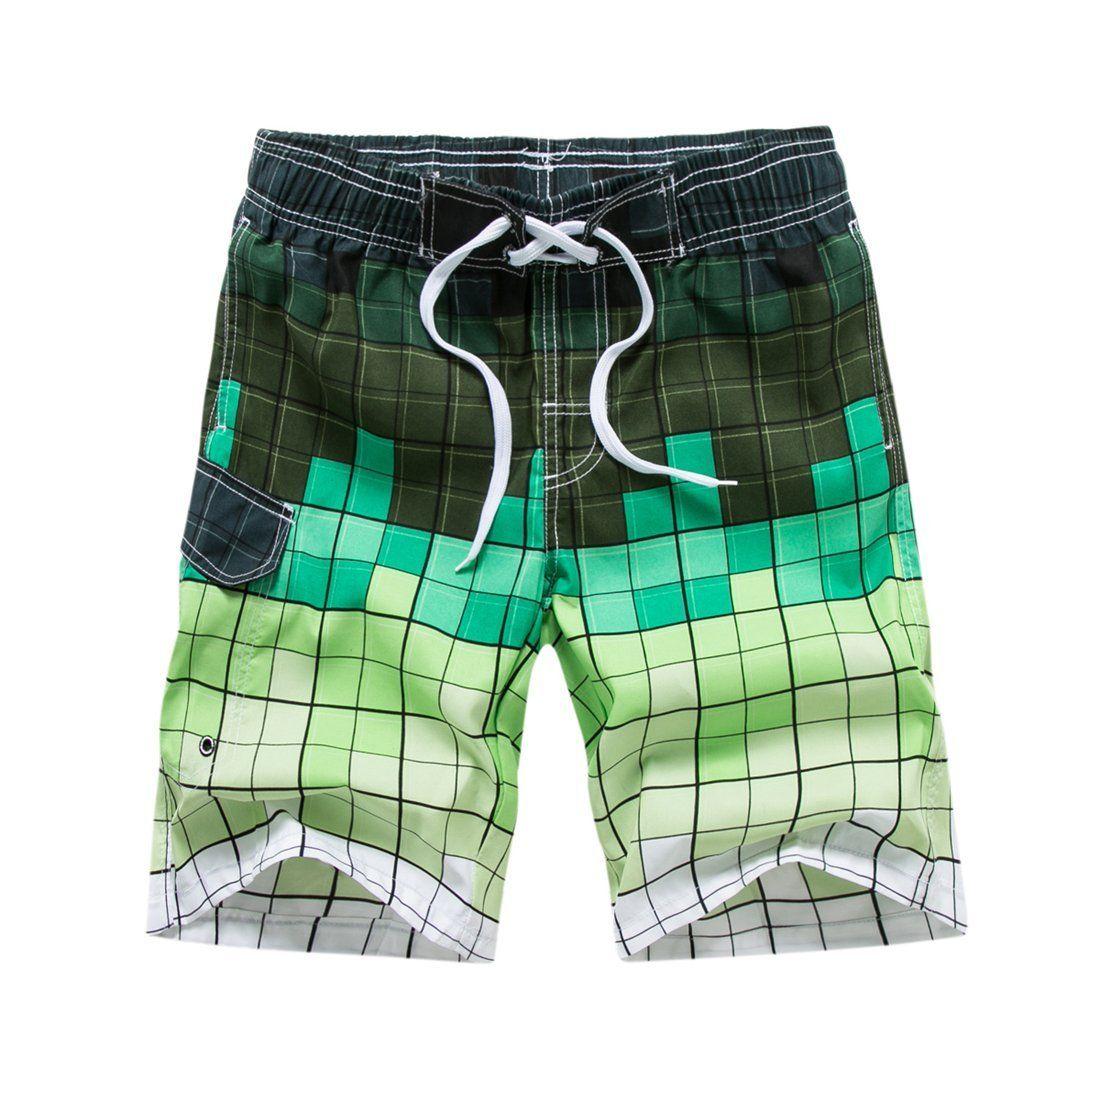 Big Hit Mens Summer Board Shorts Quick Dry Elastic Waist Swim Trunks